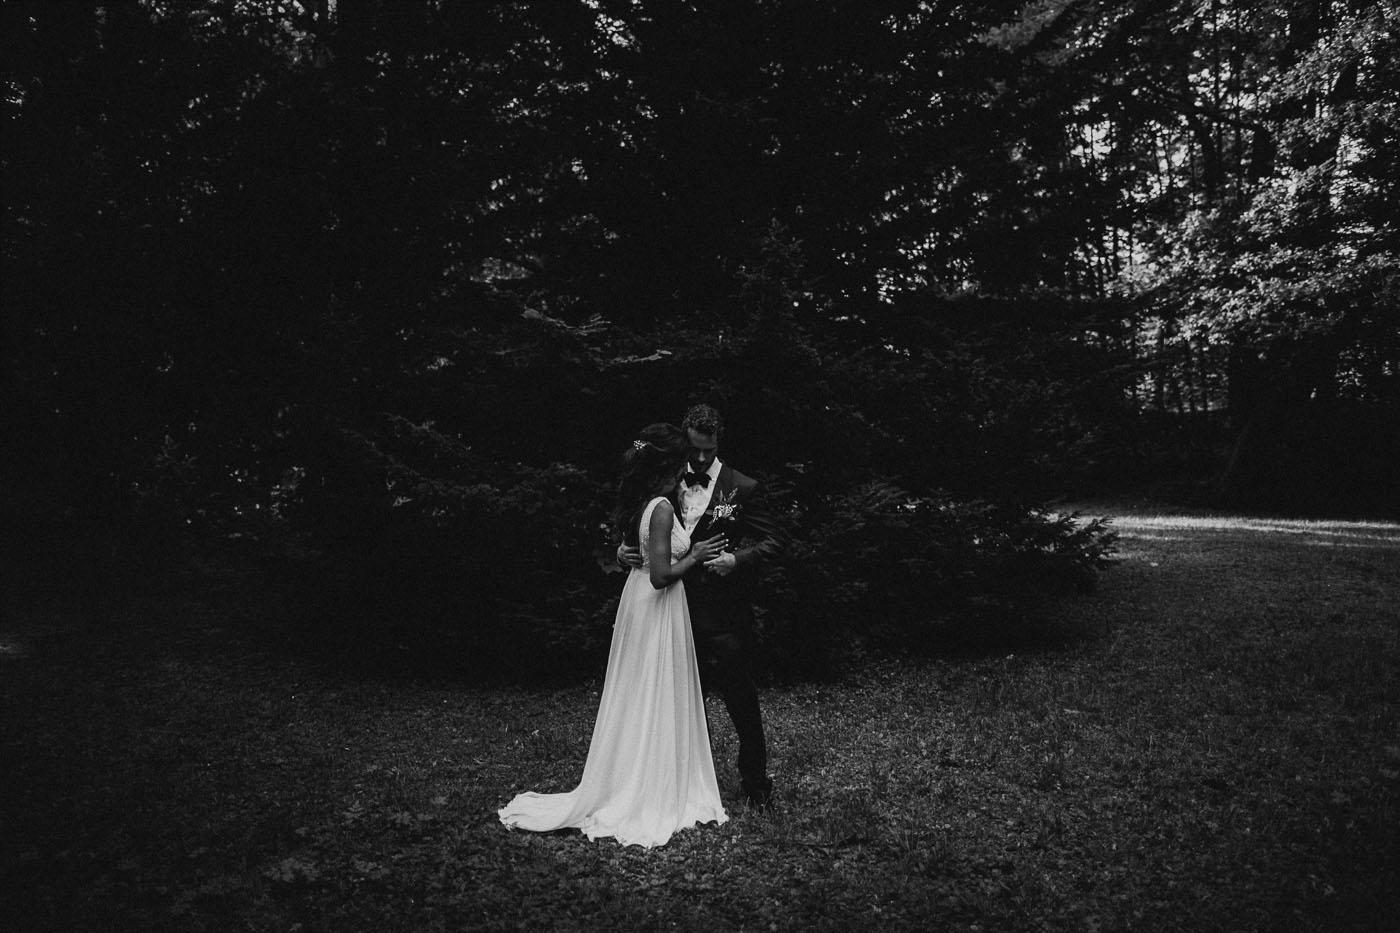 wedding-leopoldskron-photographer-47